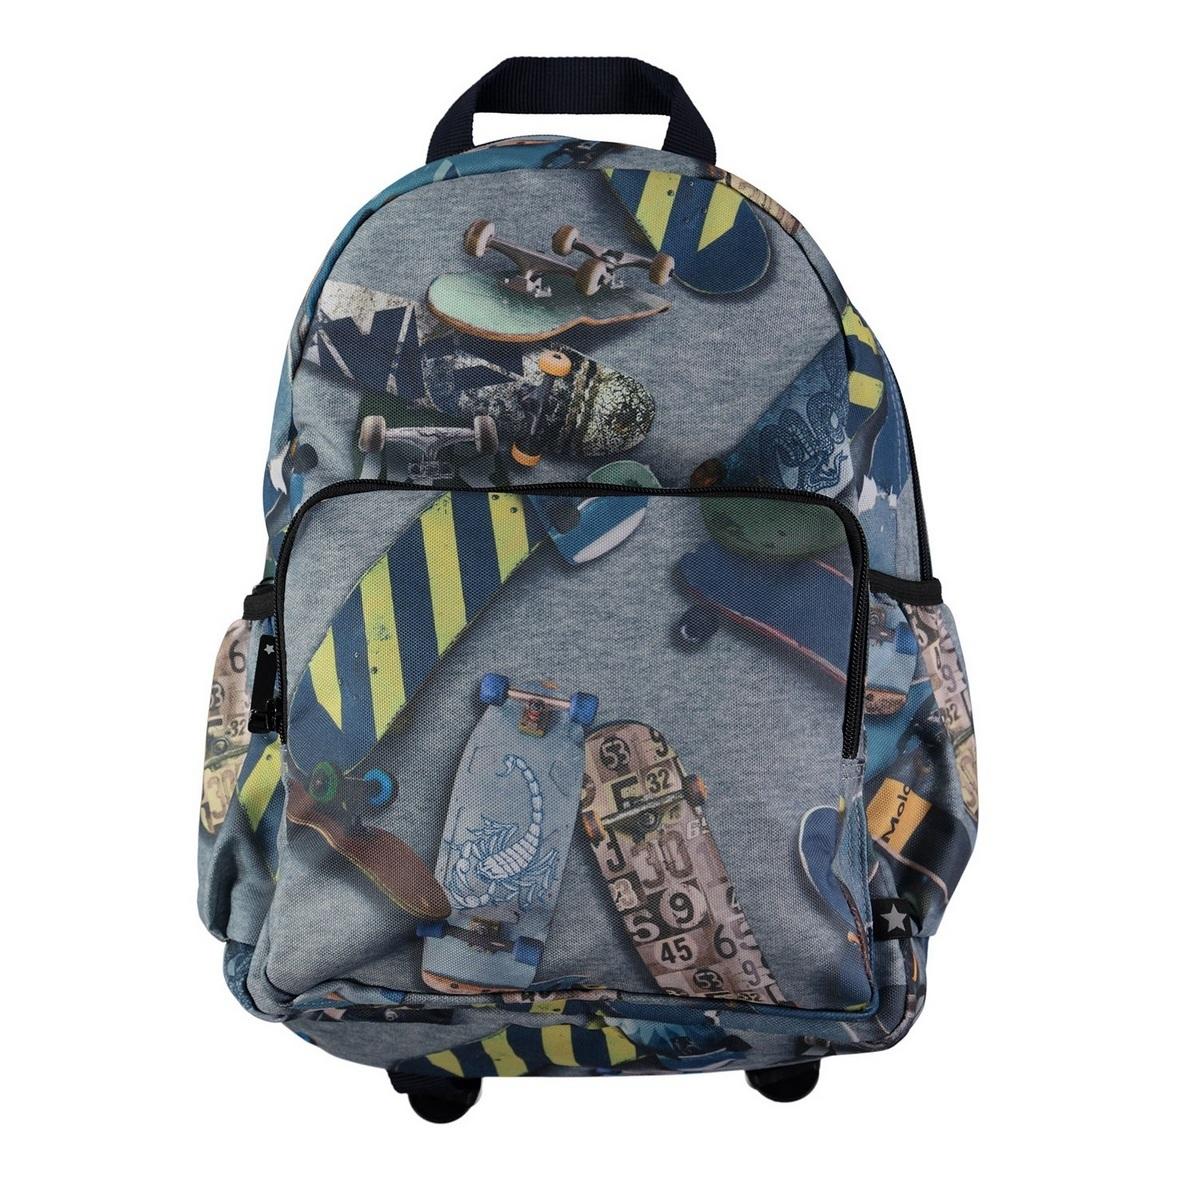 Рюкзак Molo Big backpack Skate